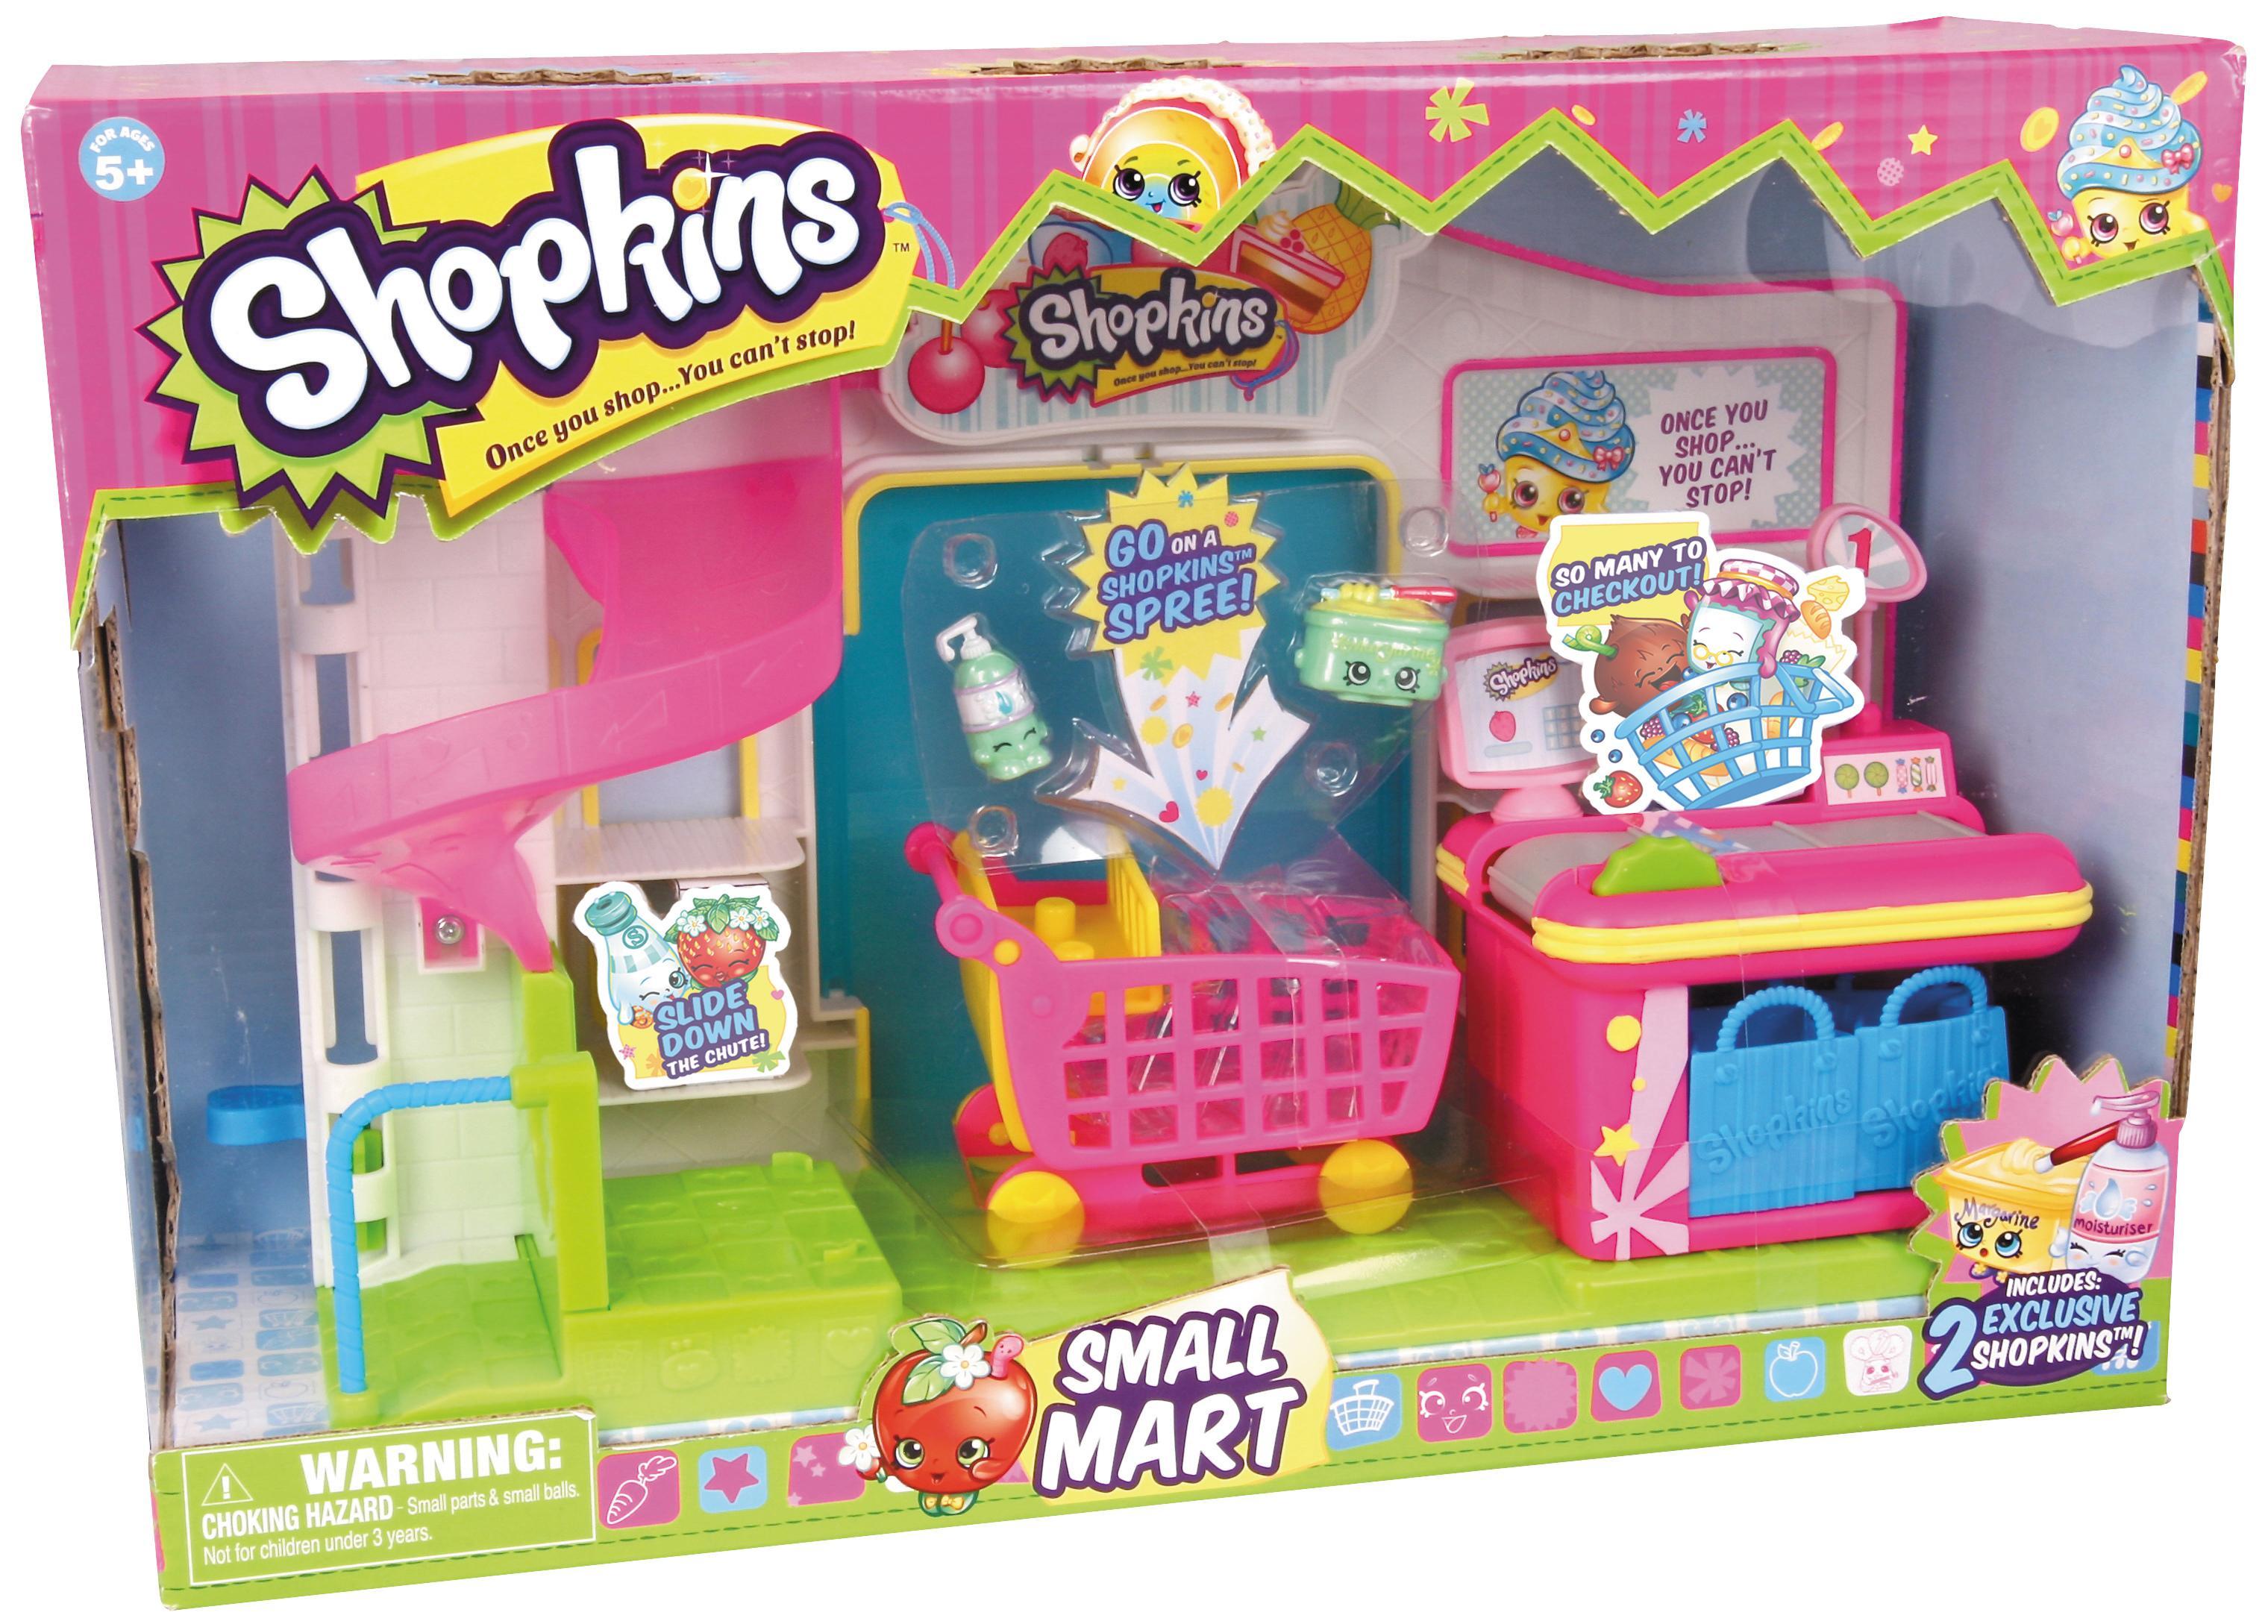 Shopkins supermarket playset playsets amazon canada - Shopkins pics ...